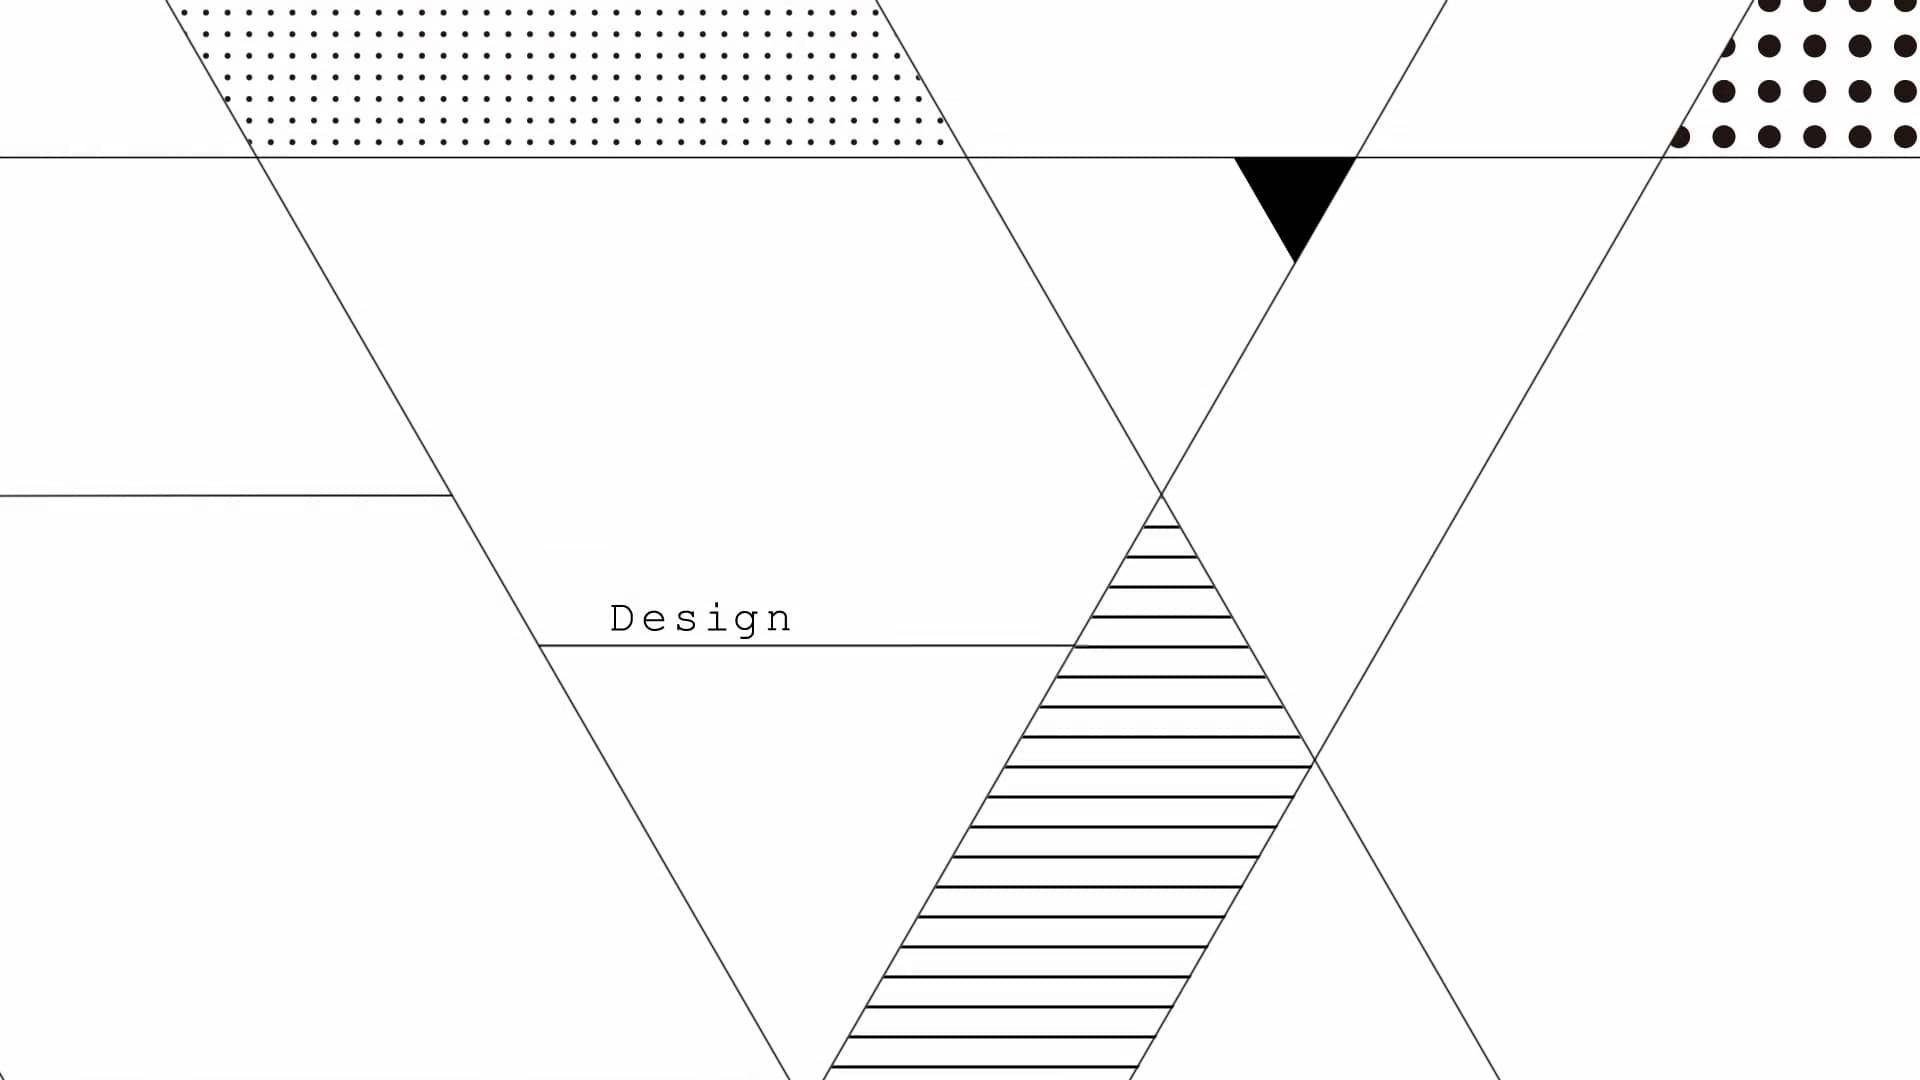 Erfreut Motion Grafik Vorlage Fotos - Entry Level Resume Vorlagen ...